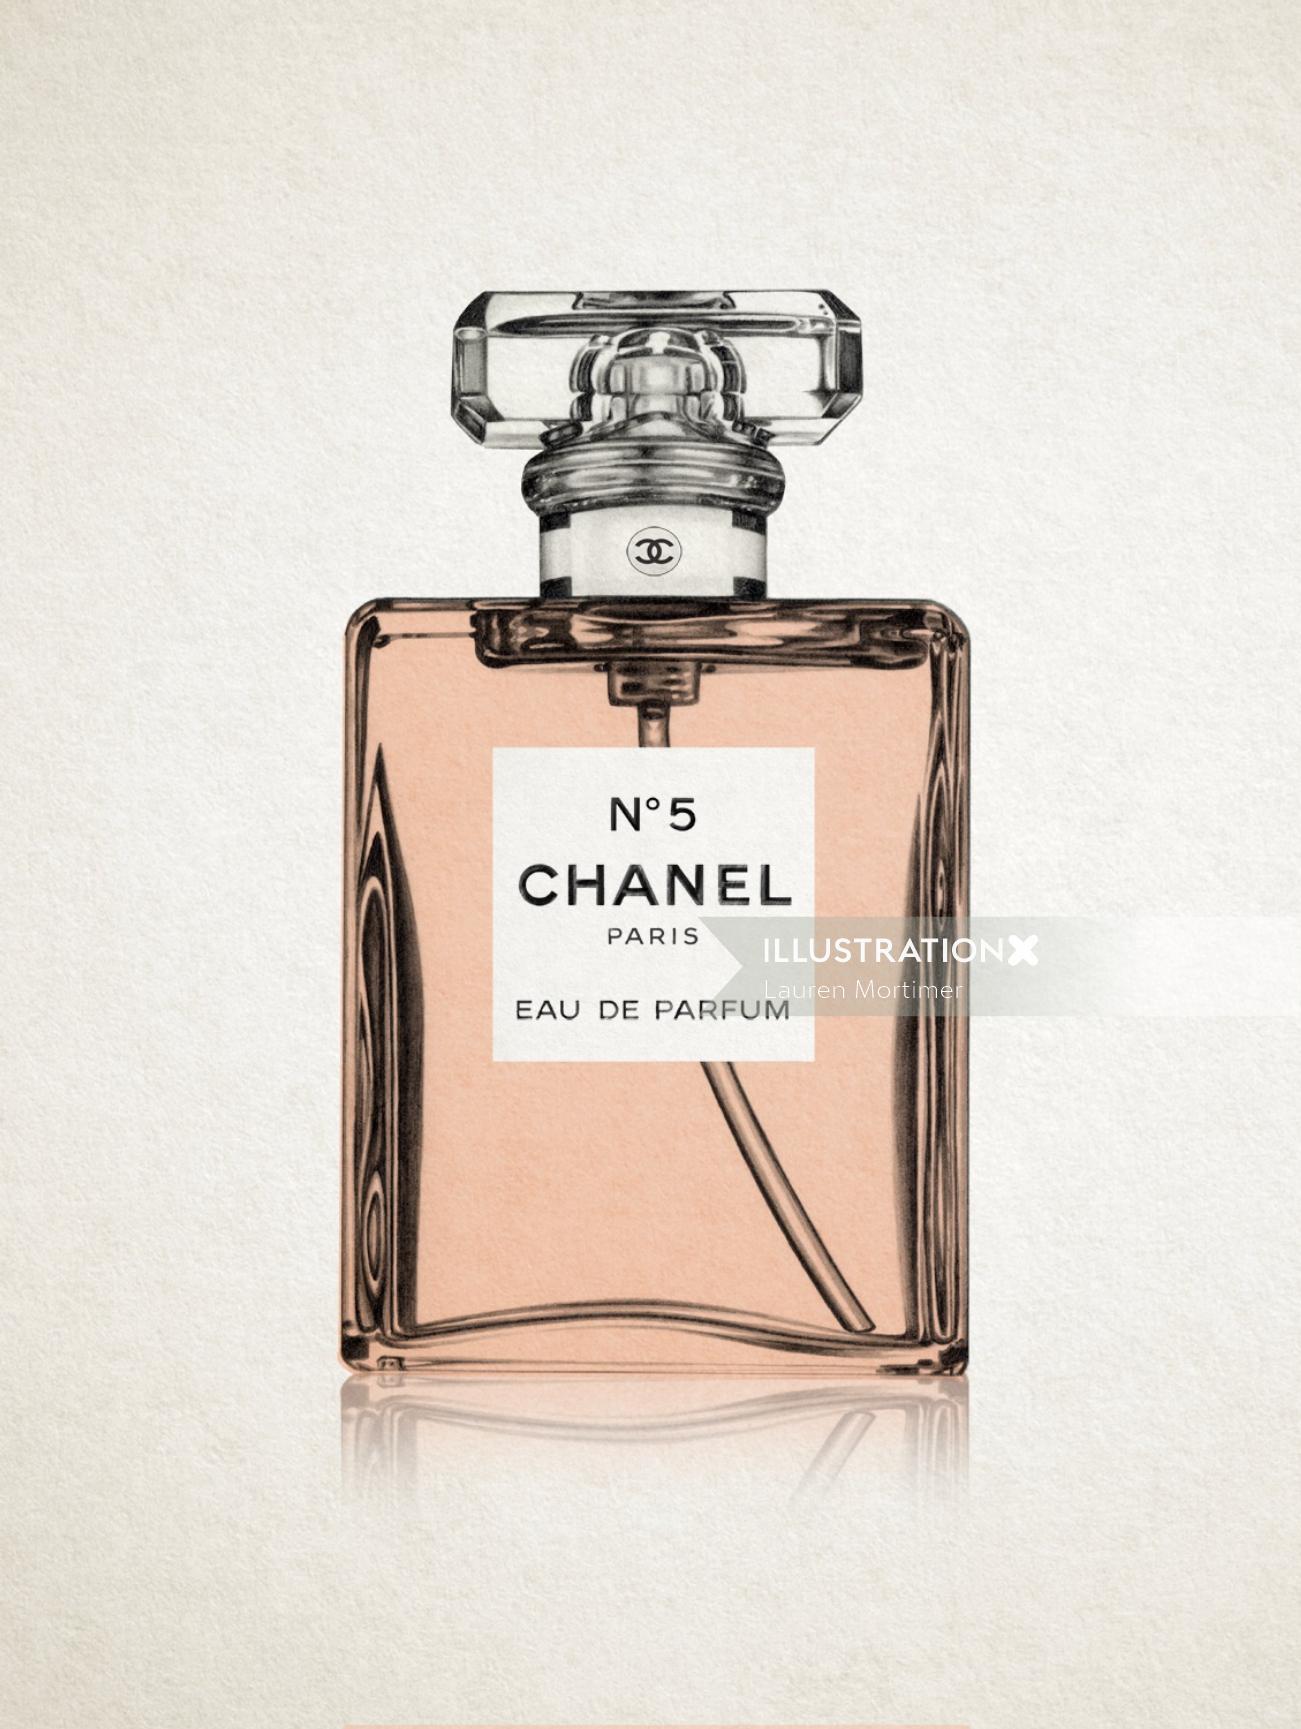 Chanel No.5 perfume bottle - Beauty illustration